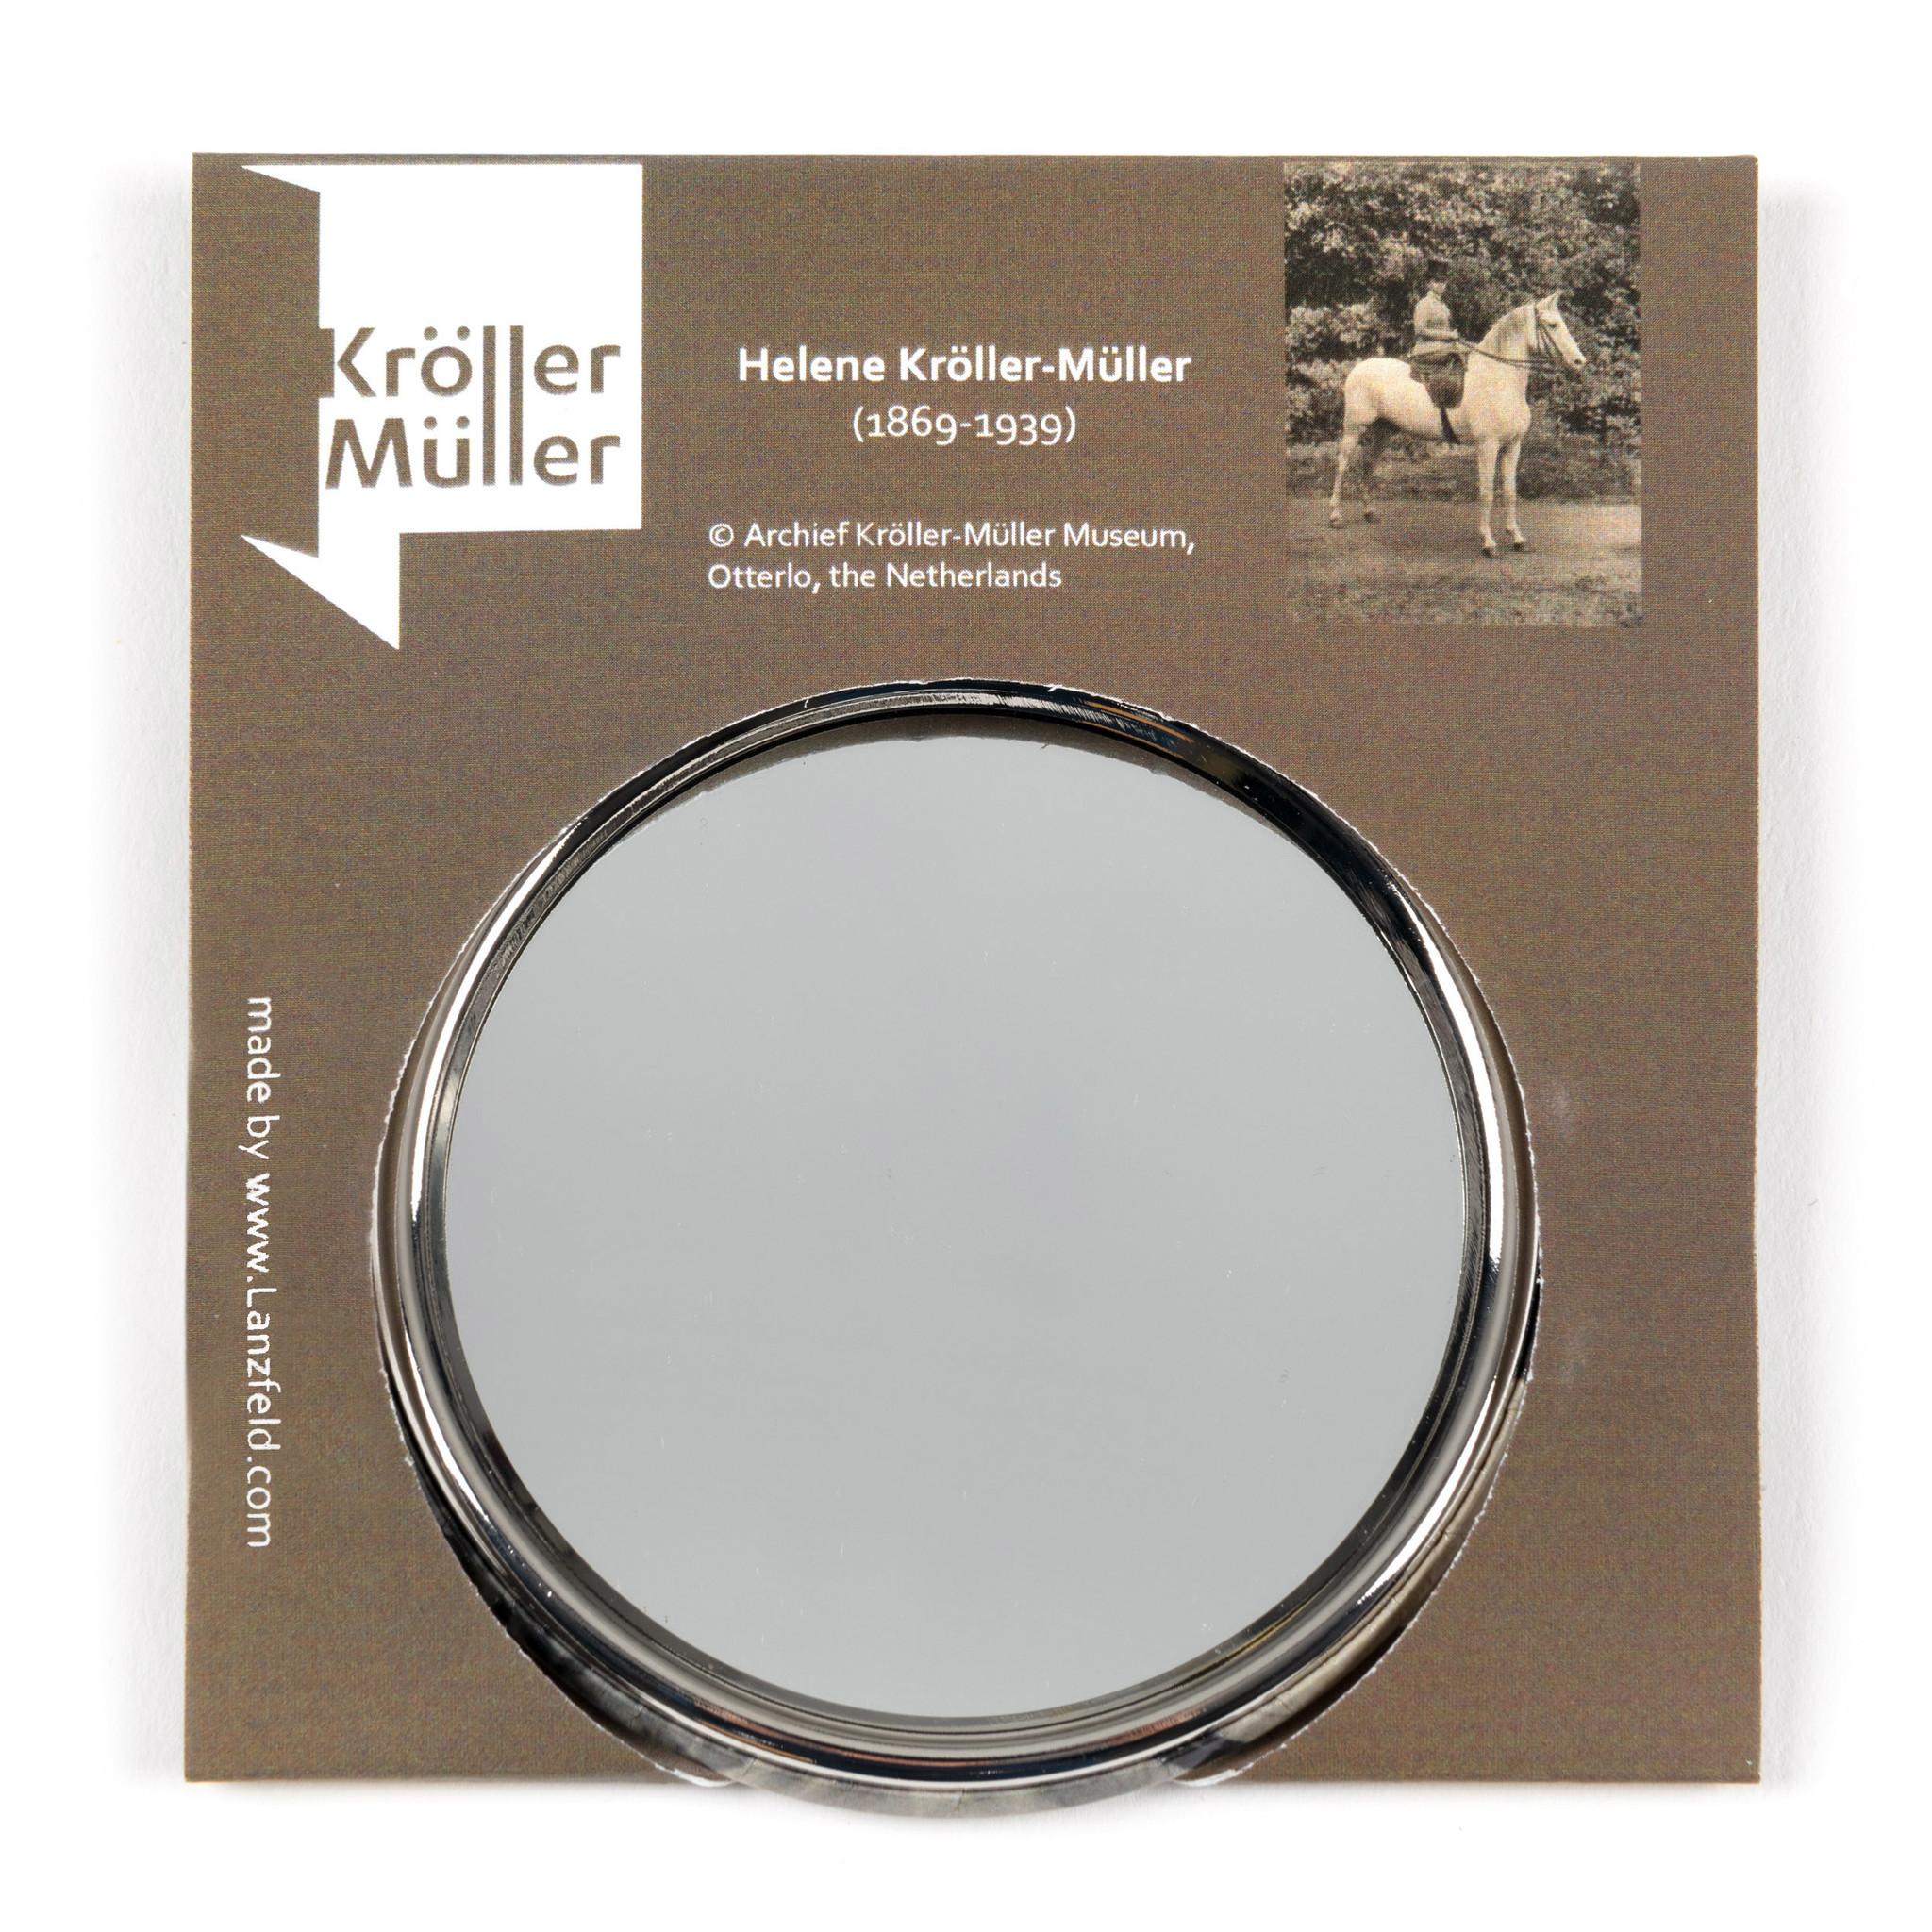 Make-up mirror Helene Kröller-Müller